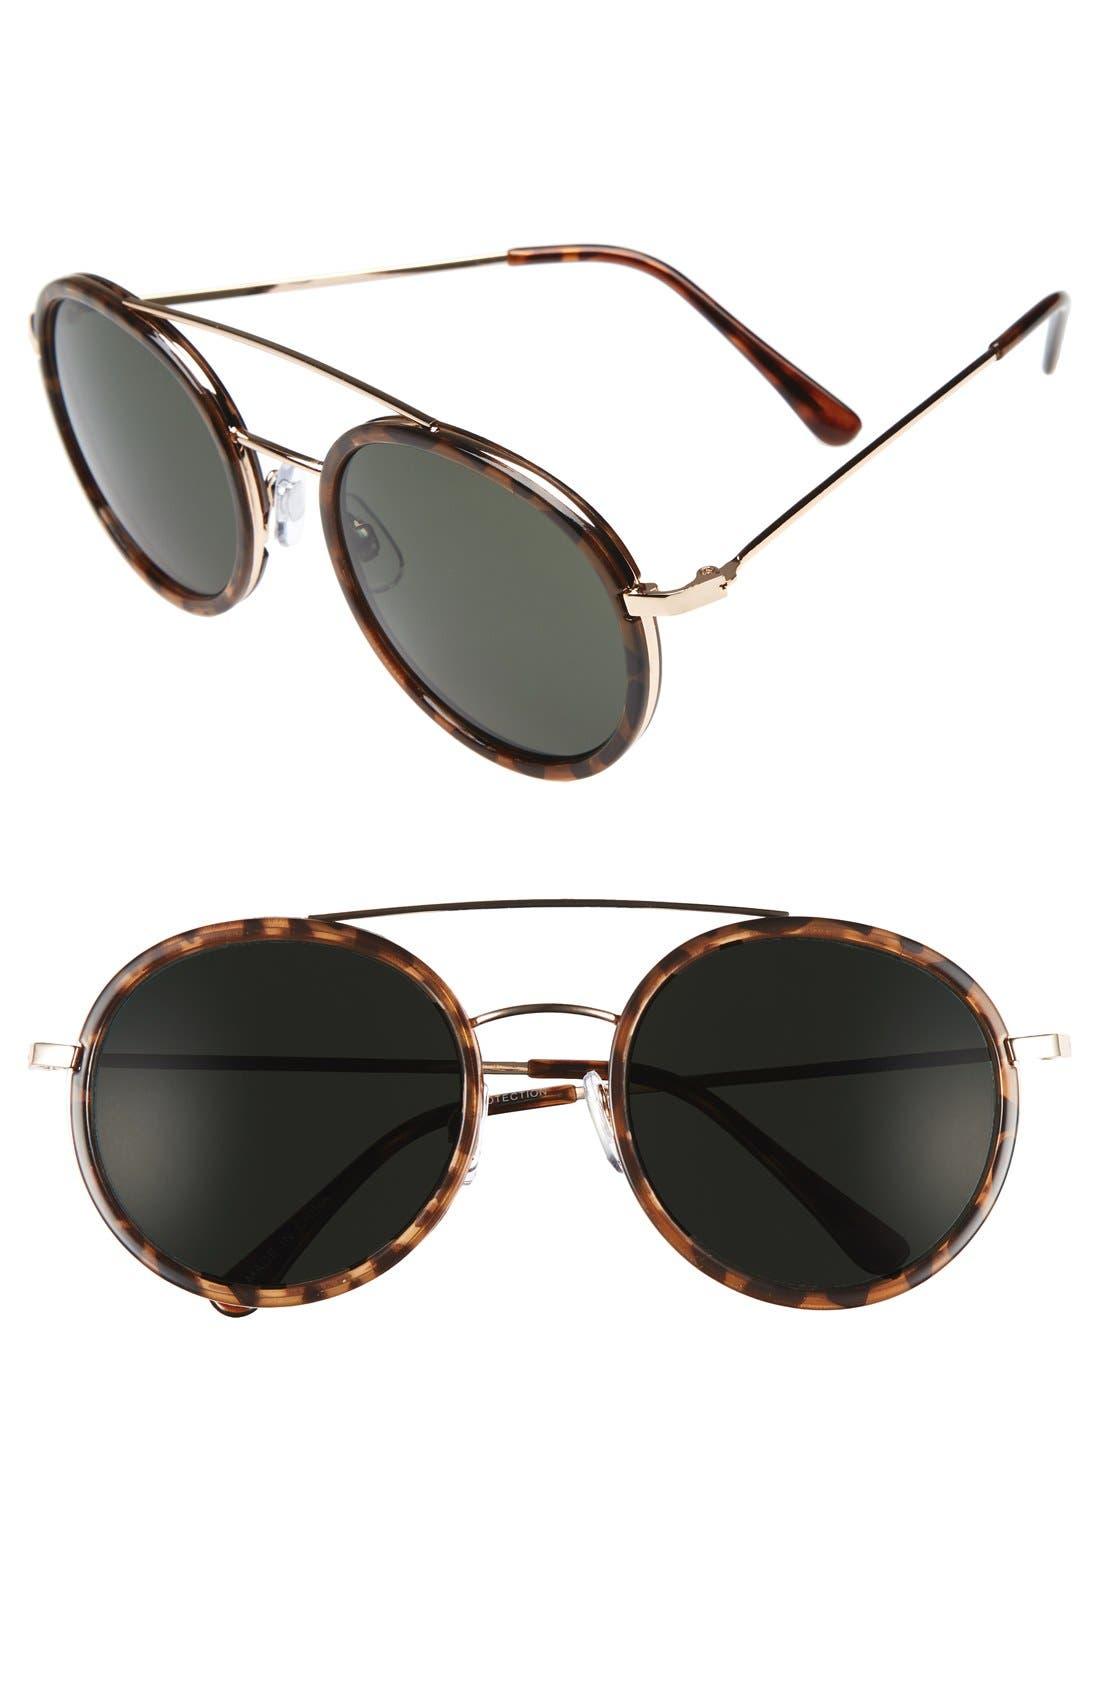 Main Image - BP. Retro 50mm Round Sunglasses